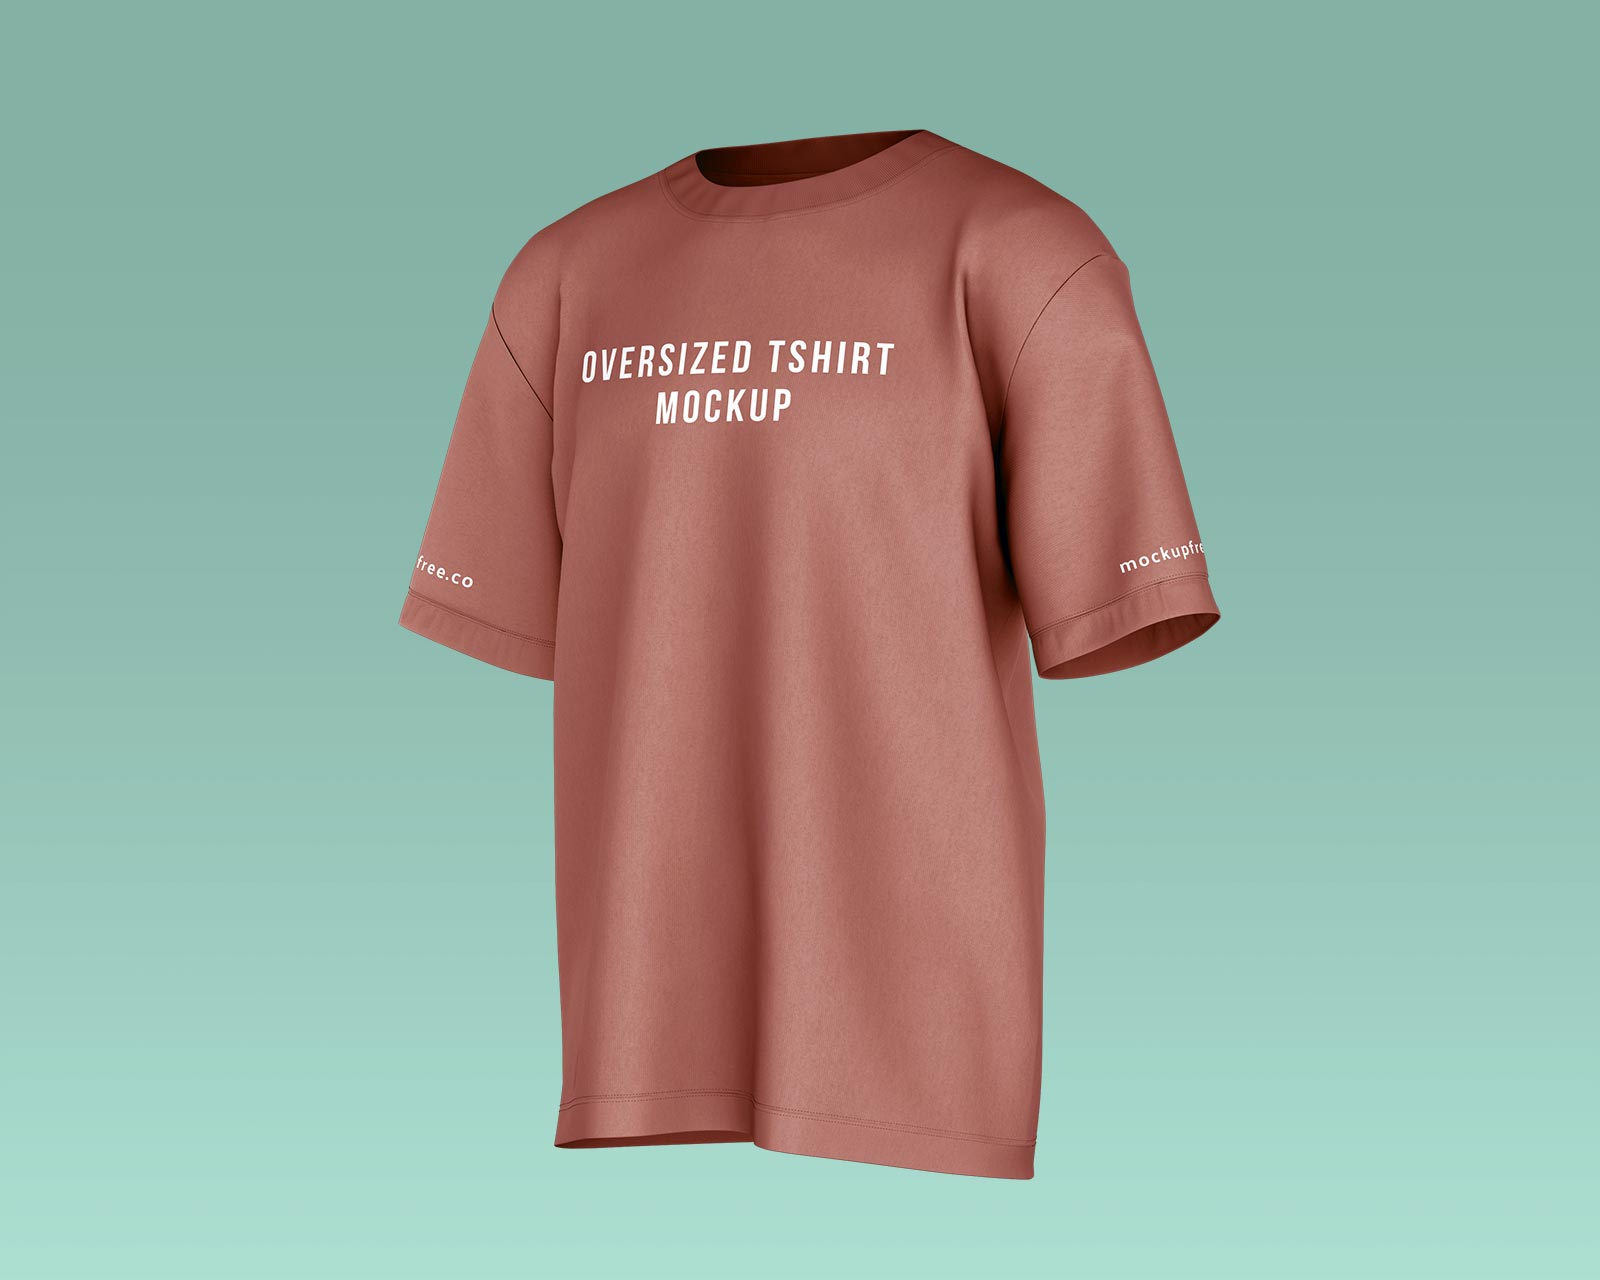 Free Oversized Half Sleeves T-Shirt Mockup PSD Set